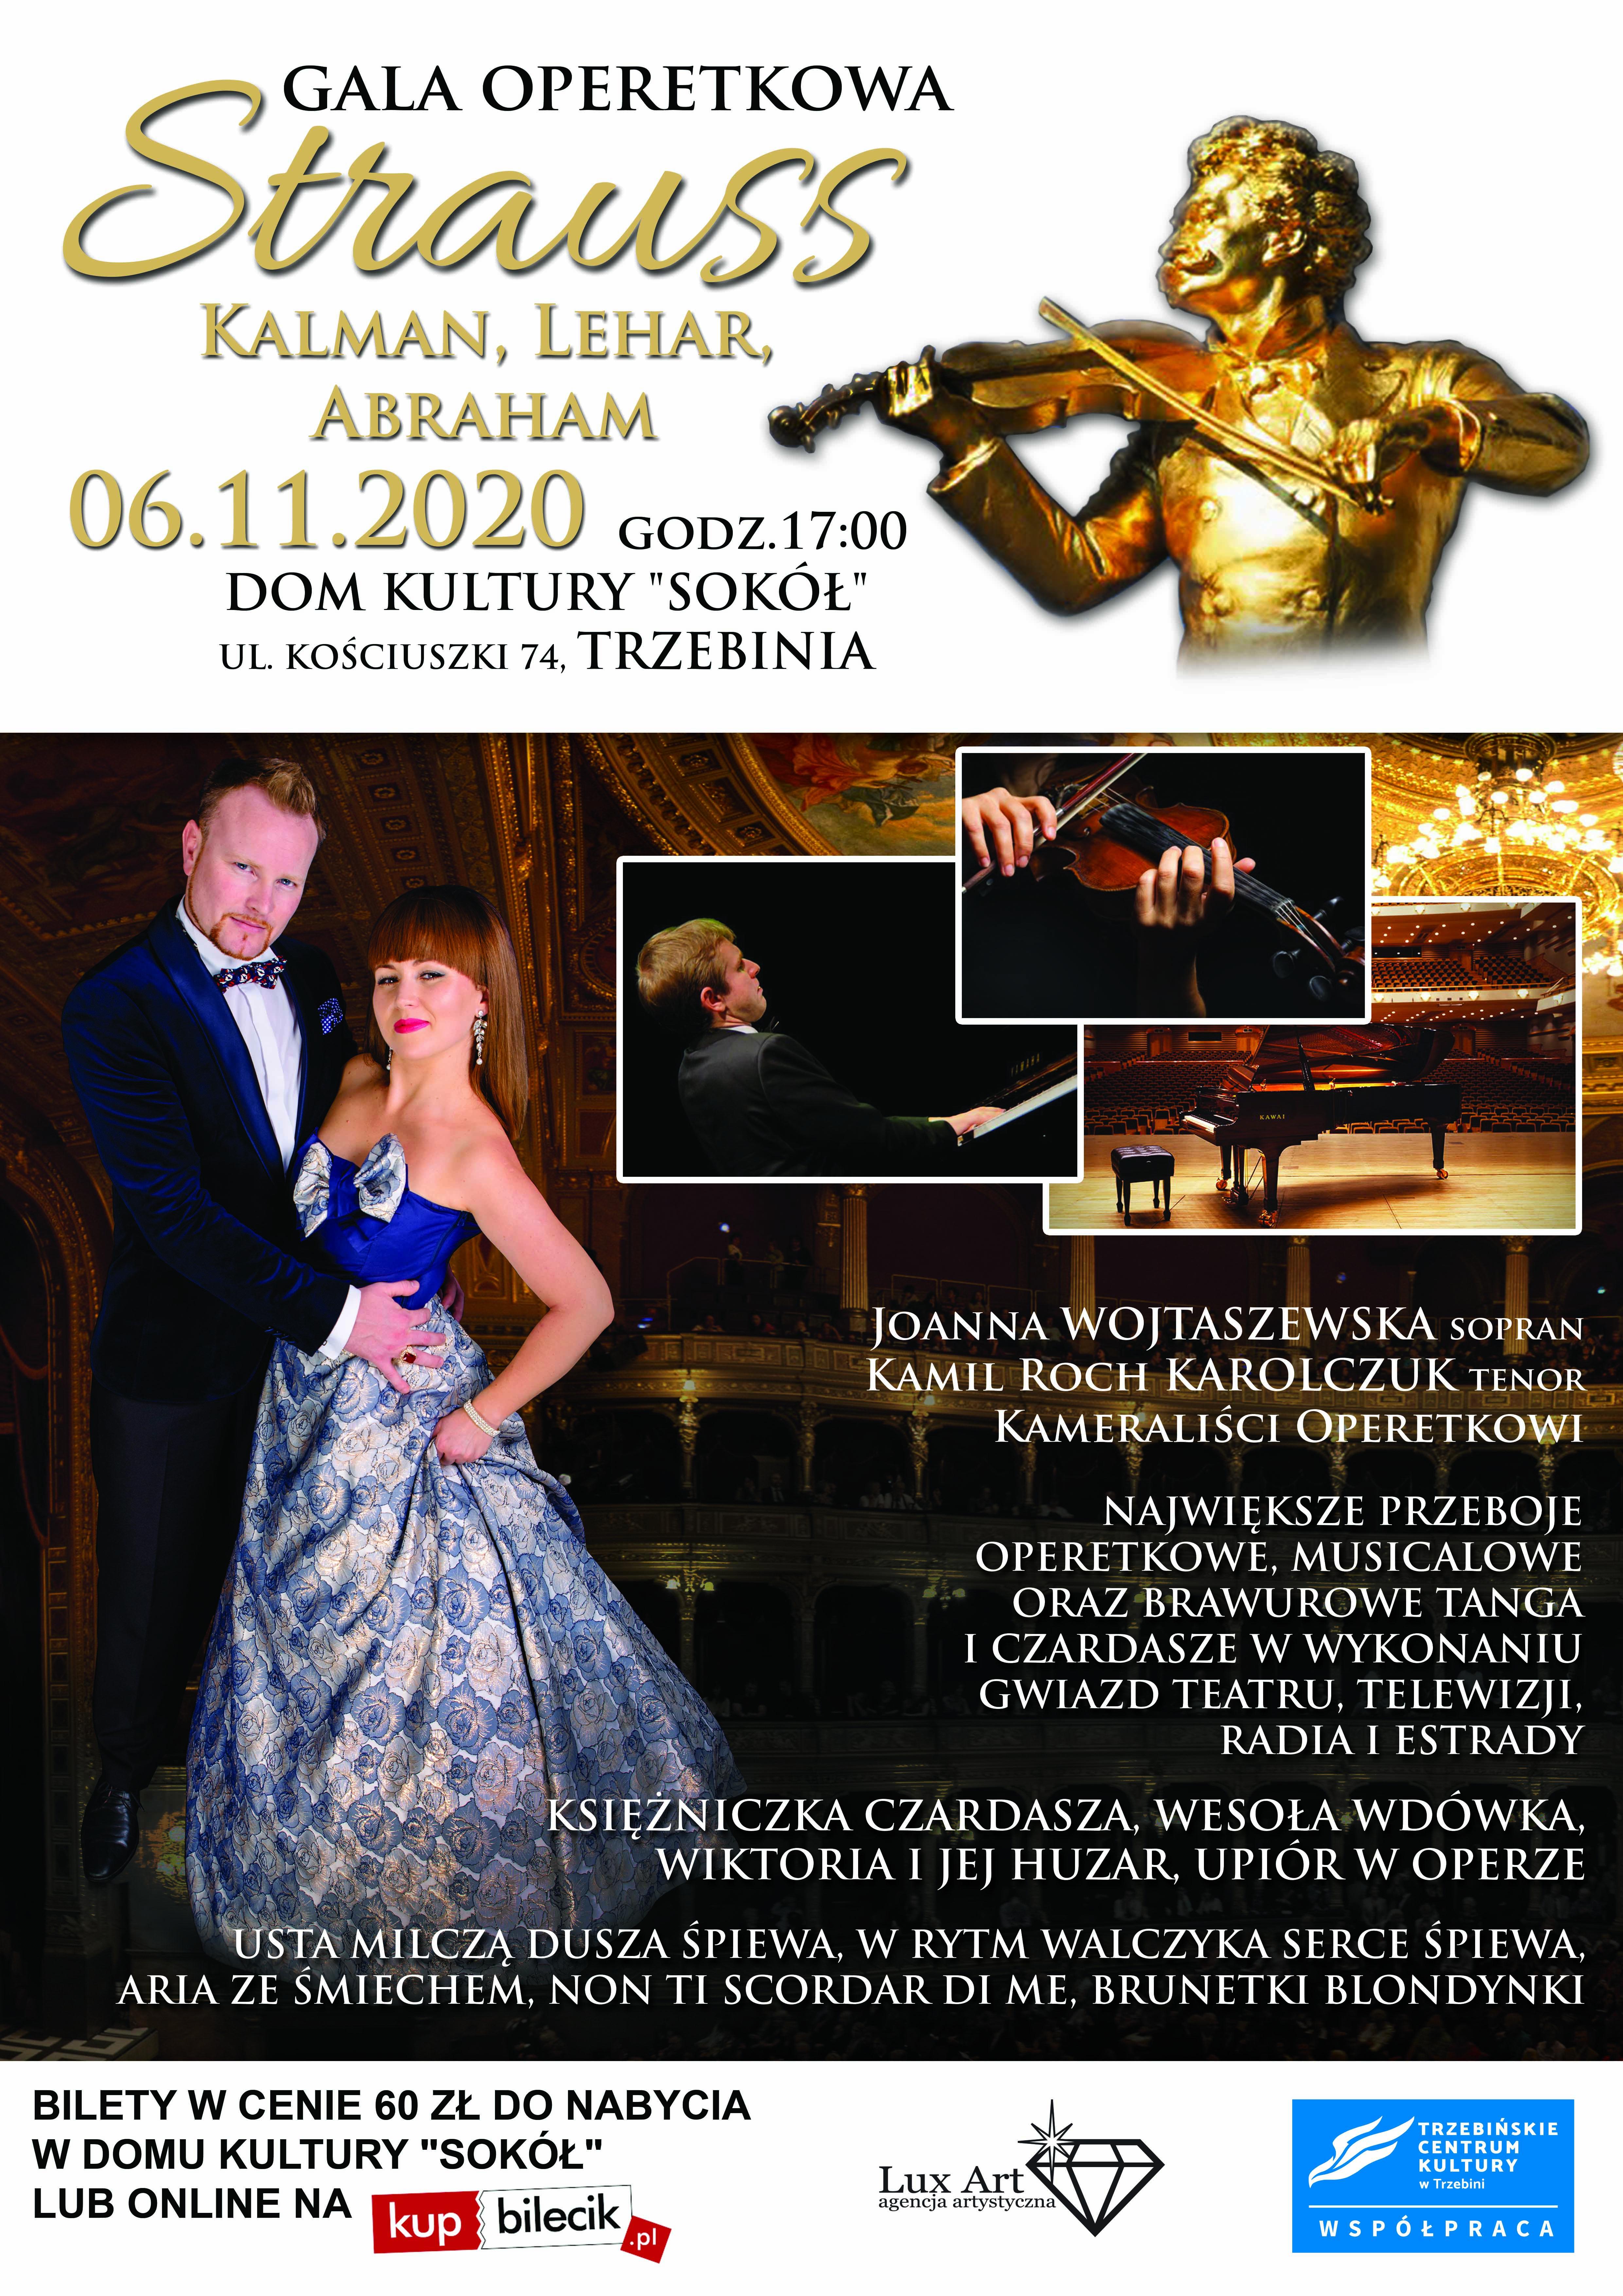 Gala Opertetkowa